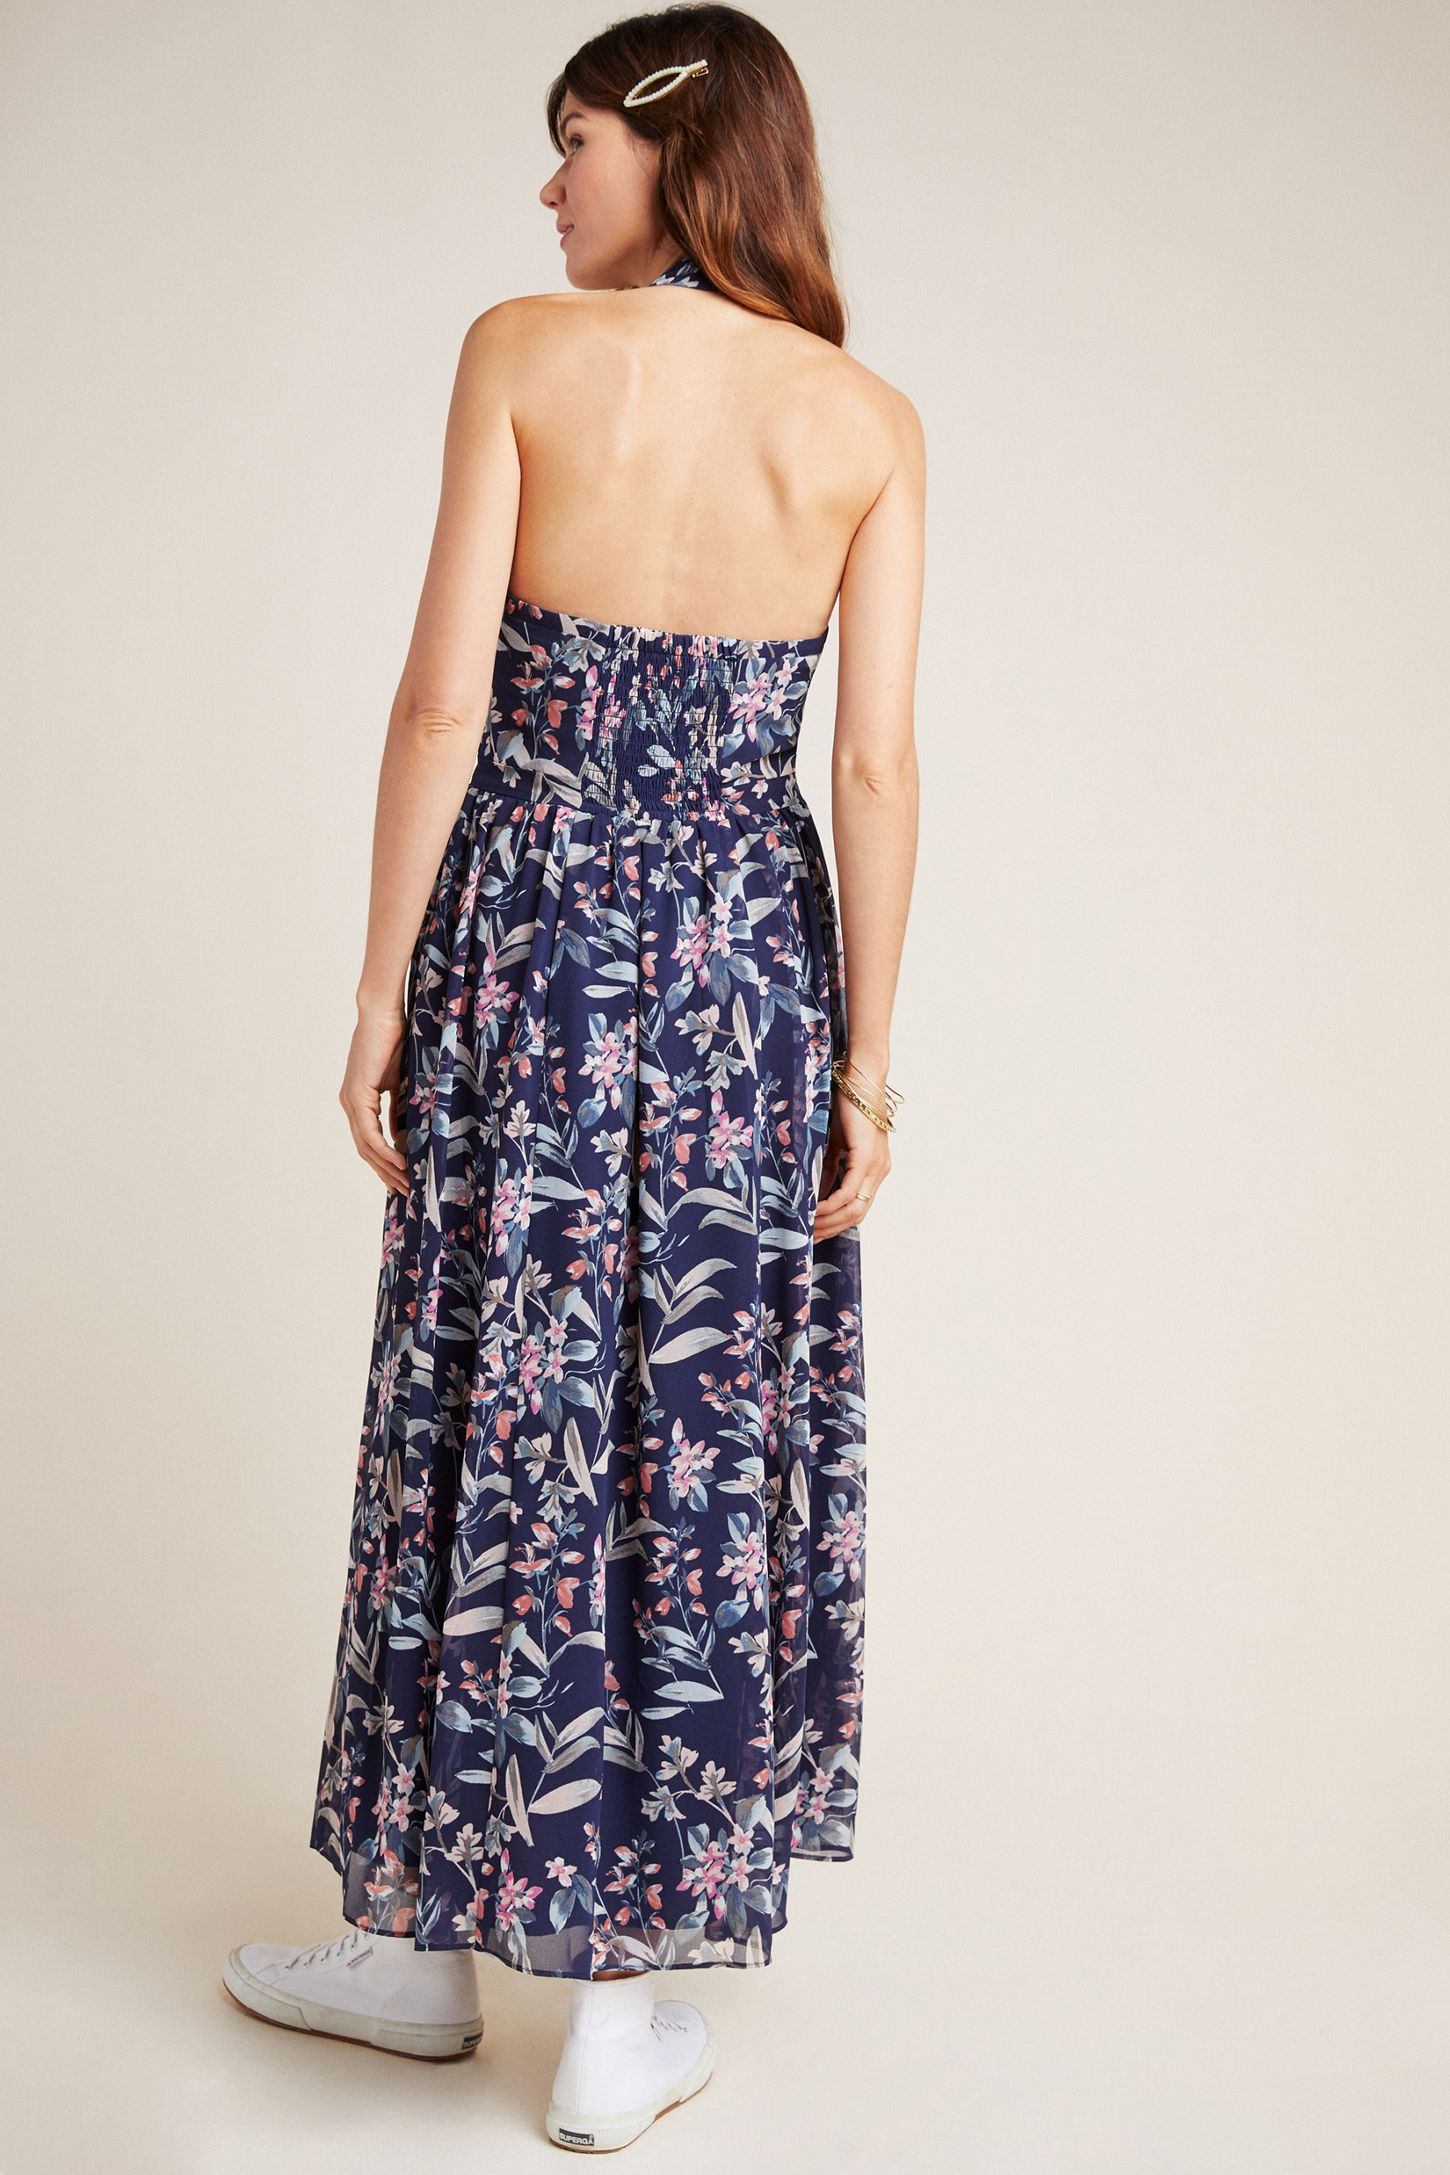 d301ee294478c Siena Floral Maxi Dress   Anthropologie